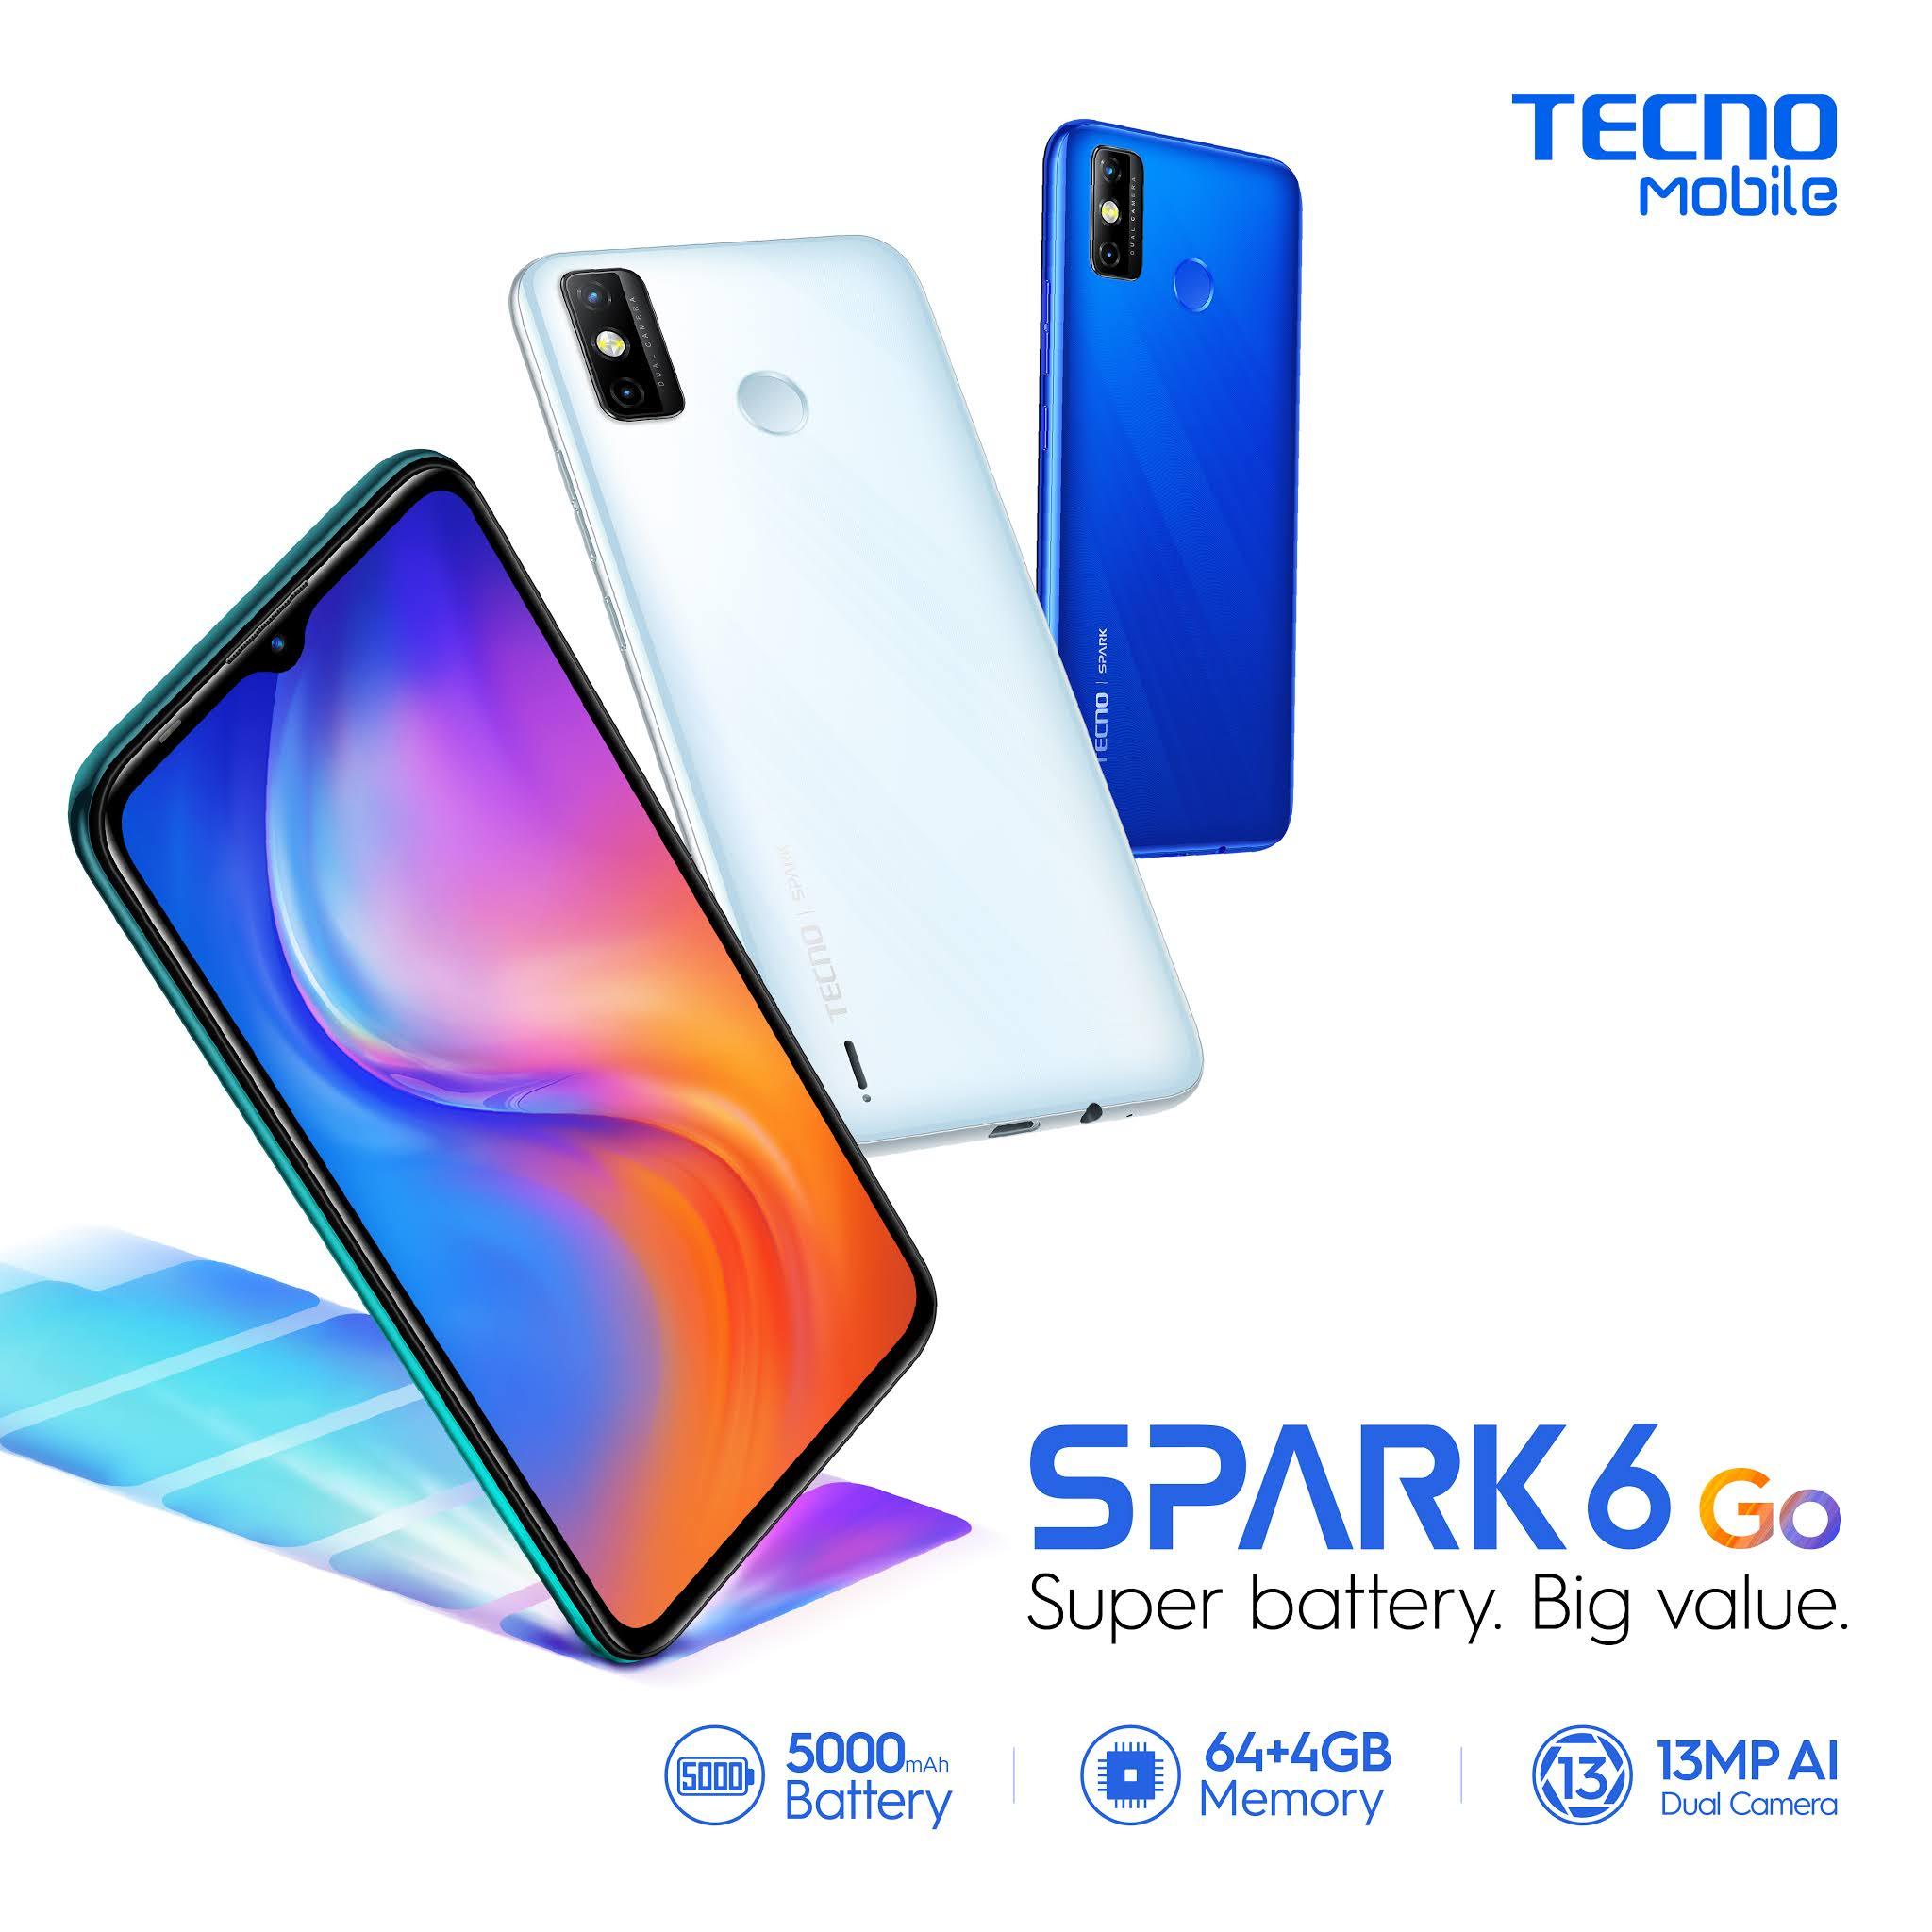 Tecno Mobile Shopee Lazada 8.8 Sale Promos